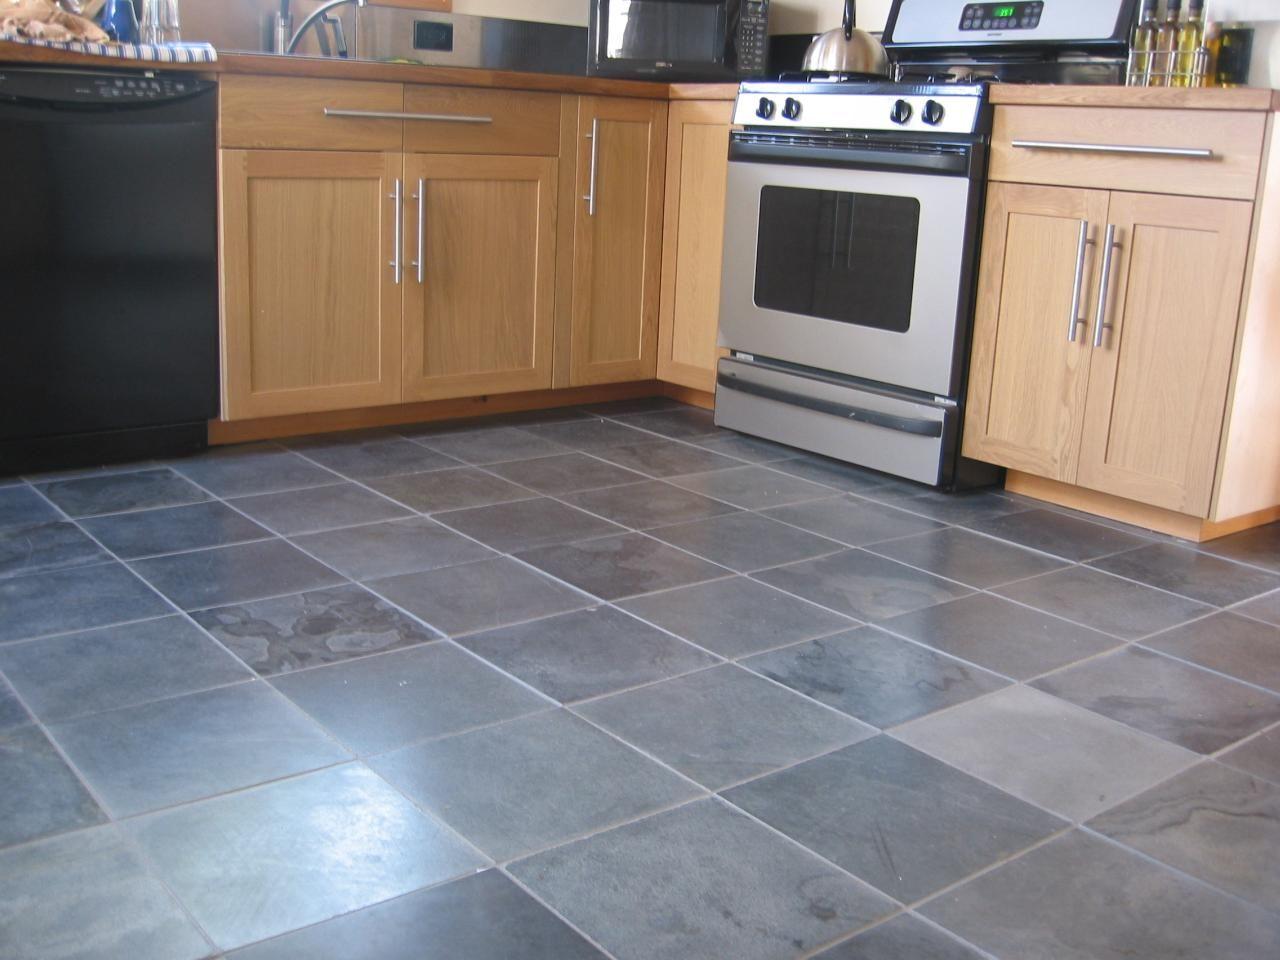 gray kitchen floor gray kitchen floor Slate Floor Tiles Kitchen Amazing Decoration Decorating Ideas This Gray tile flooring will be